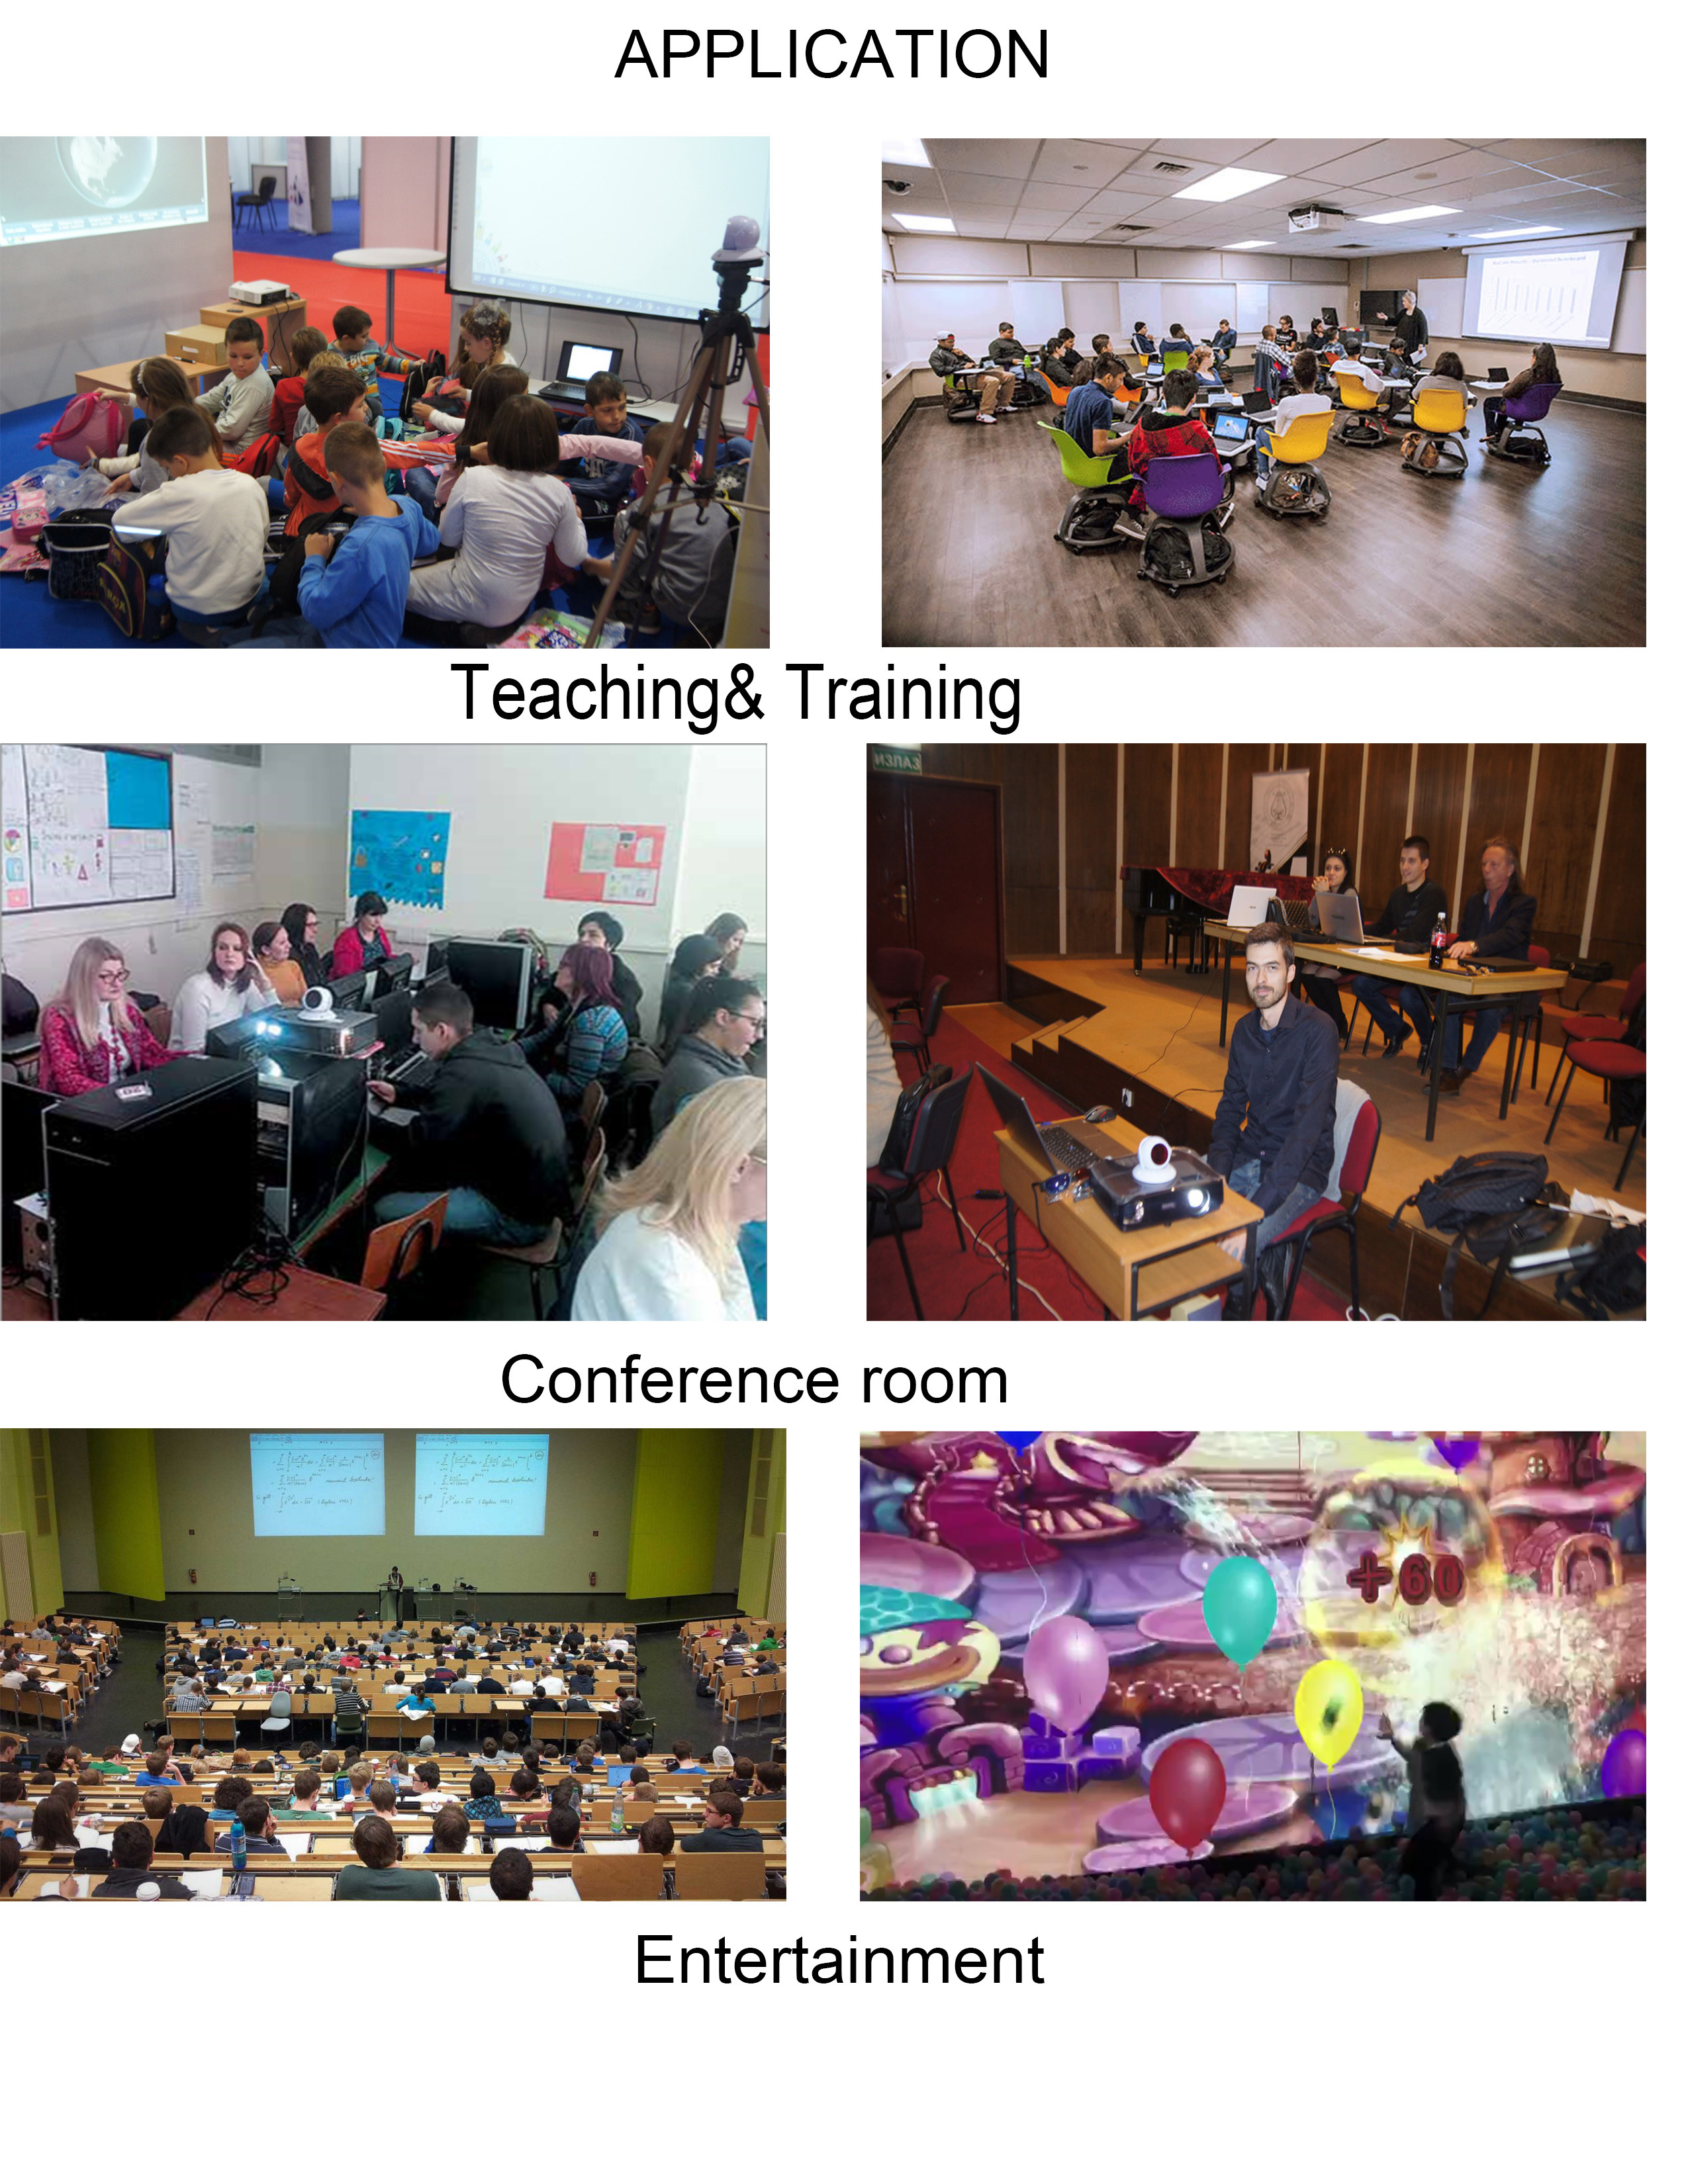 Education Digital Interactive Whiteboard Multi Touch Smart Board for Classroom